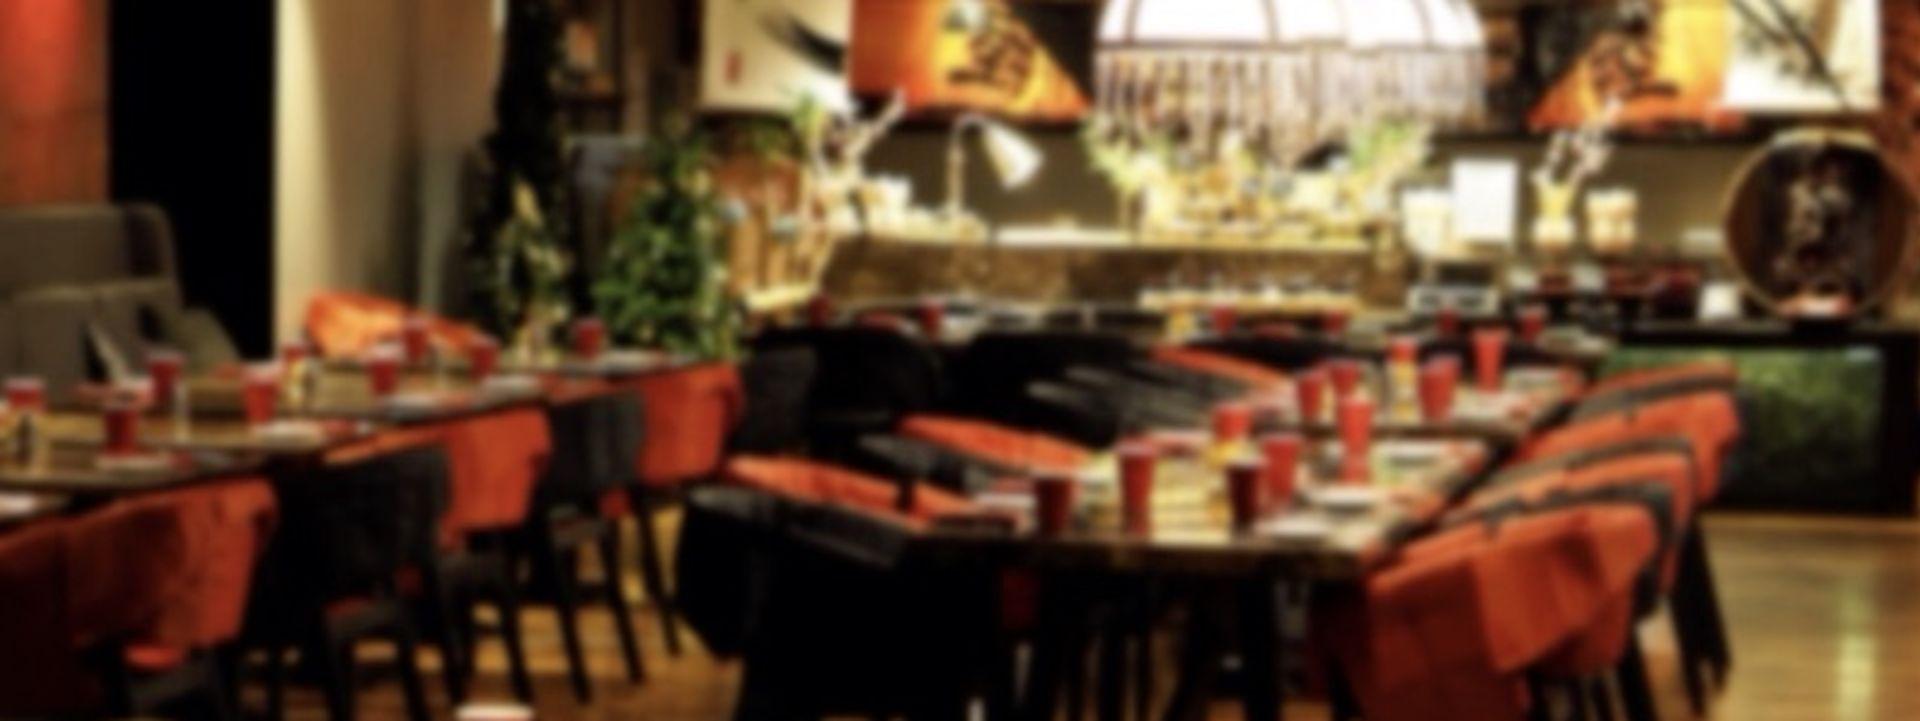 Tell Us Your Favorite Restaurant